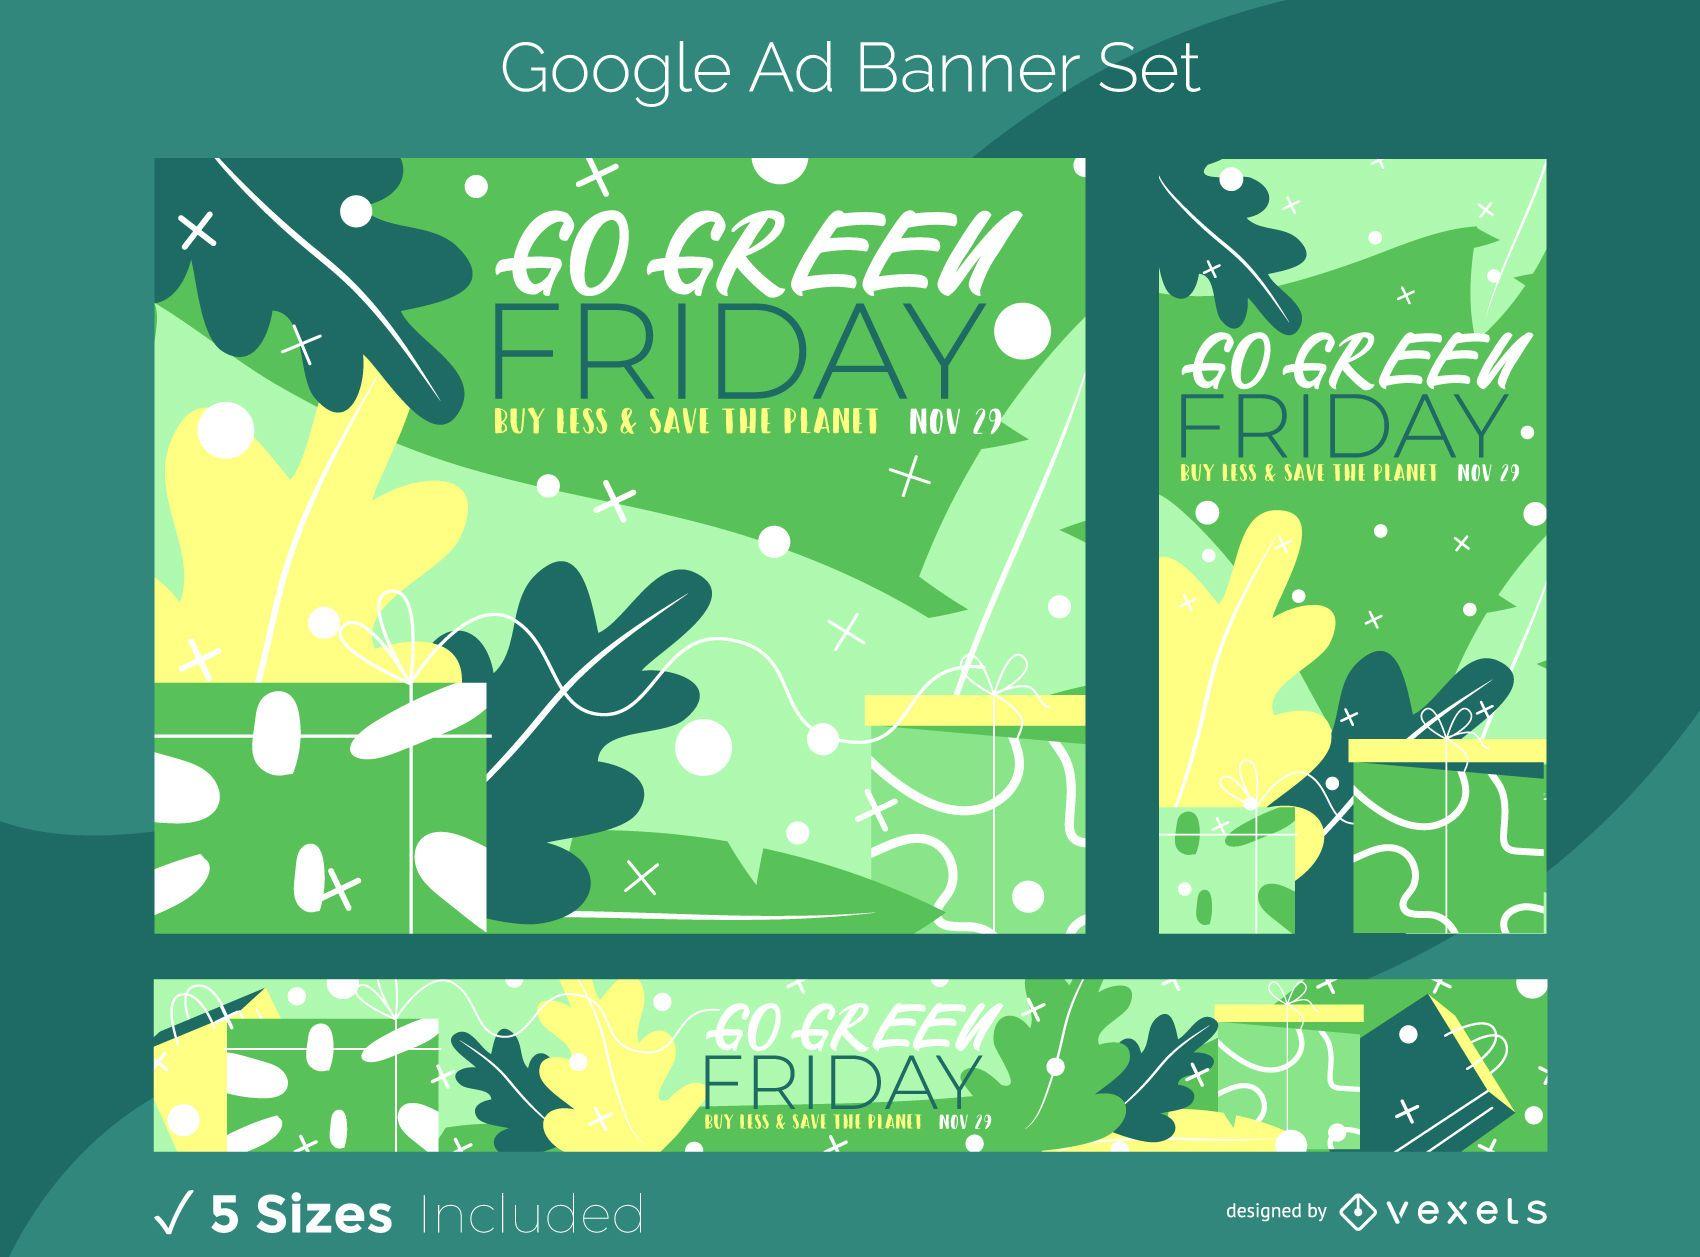 Green Nature Friday Google Ads Banner Set